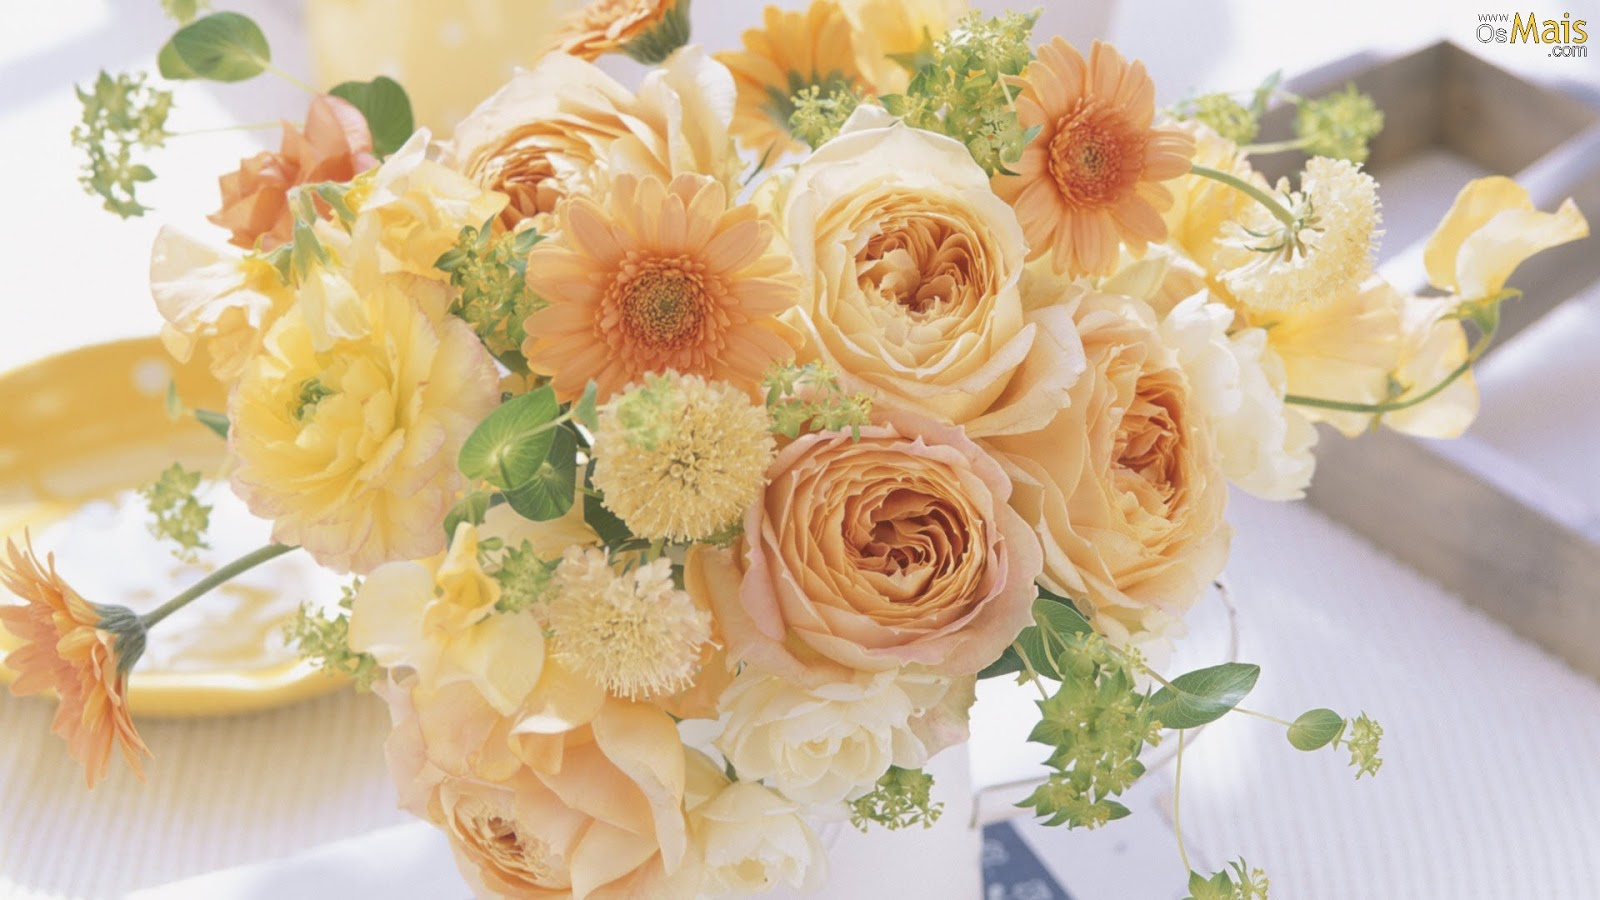 Wallpapernarium ramo de flores hermosas - Ramos de flores hermosas ...